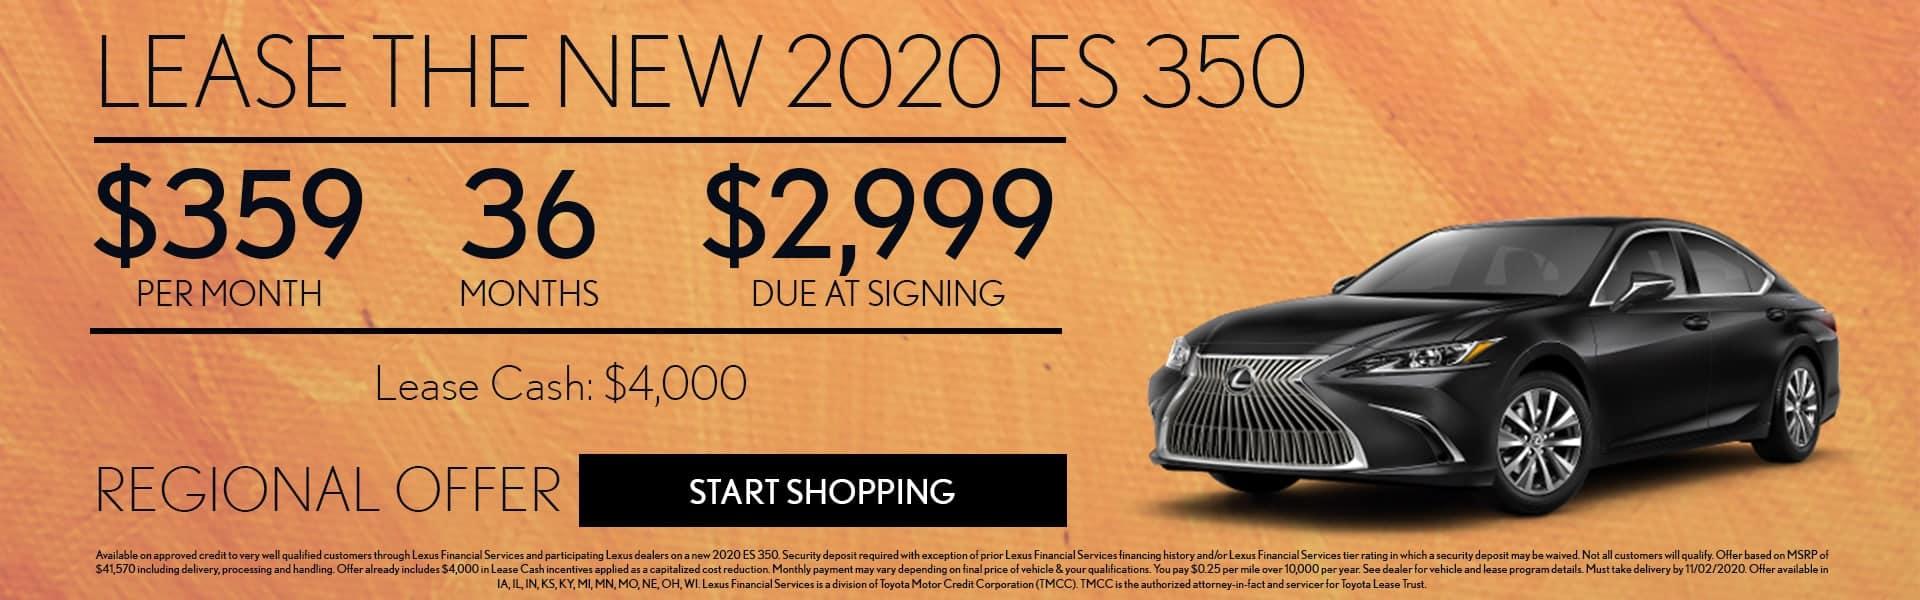 2020 Lexus ES 350 lease offer